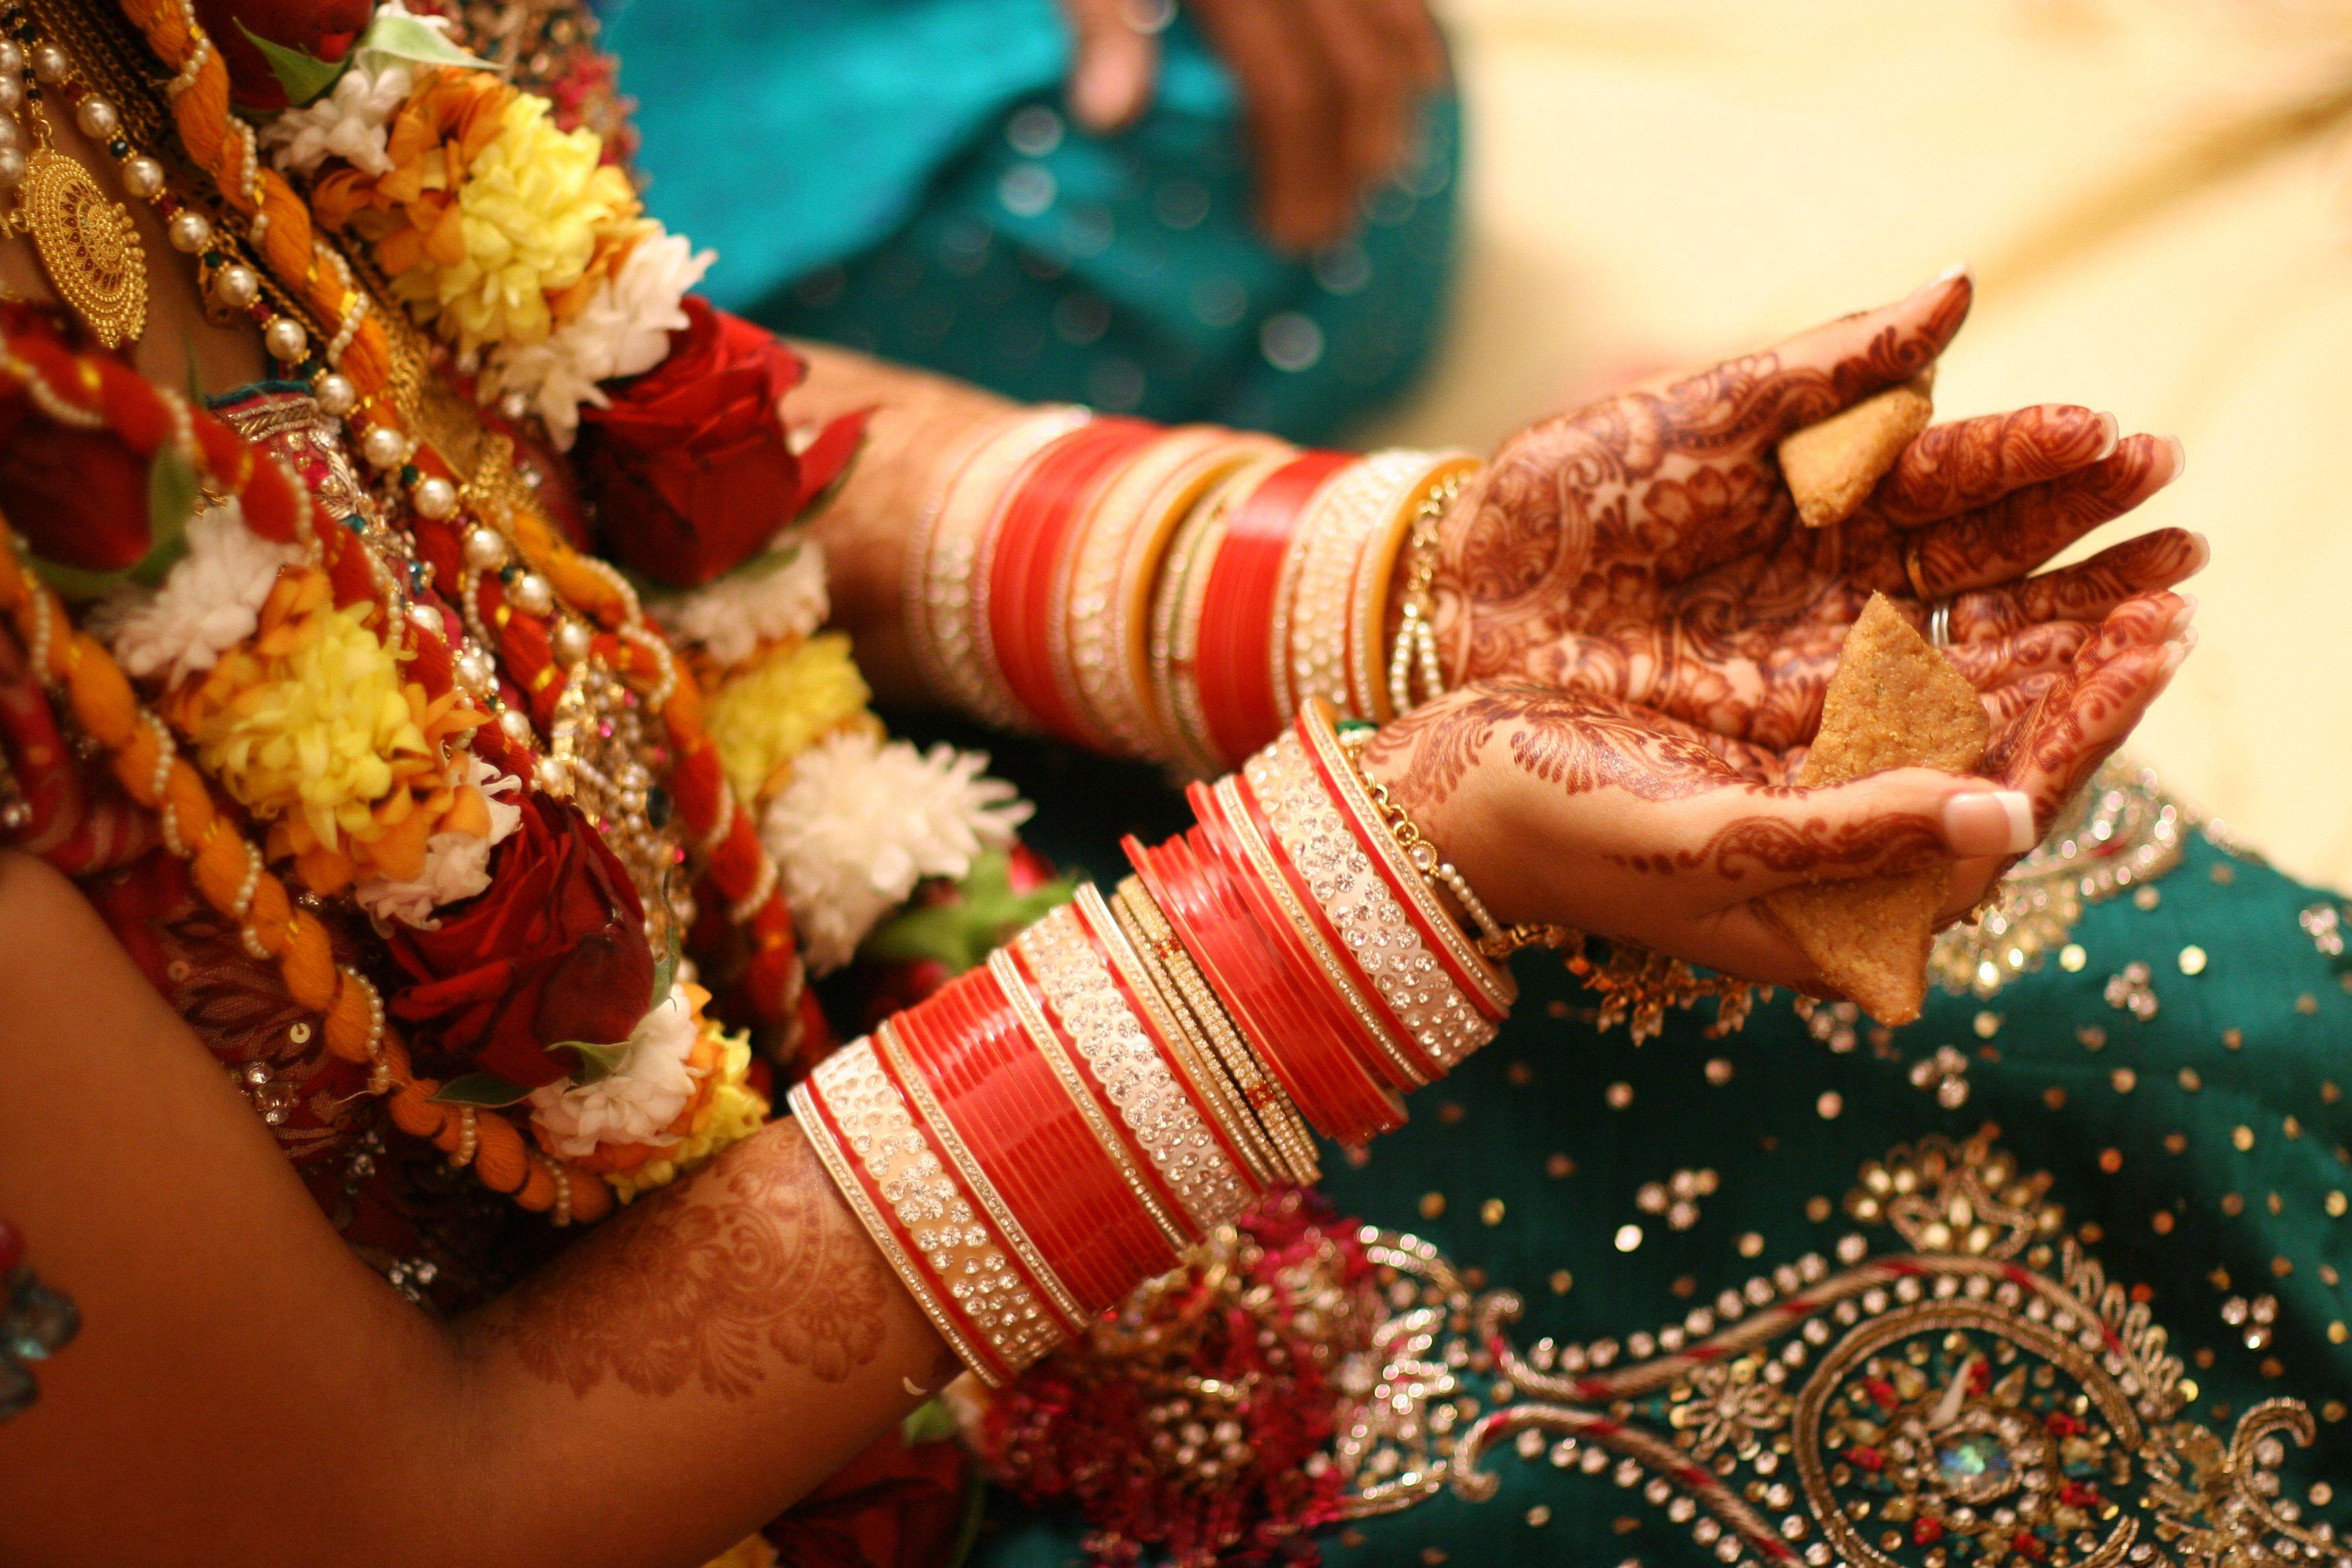 Indian Wedding Games | Indian Wedding Games Wedding Games Pinterest Wedding Wedding